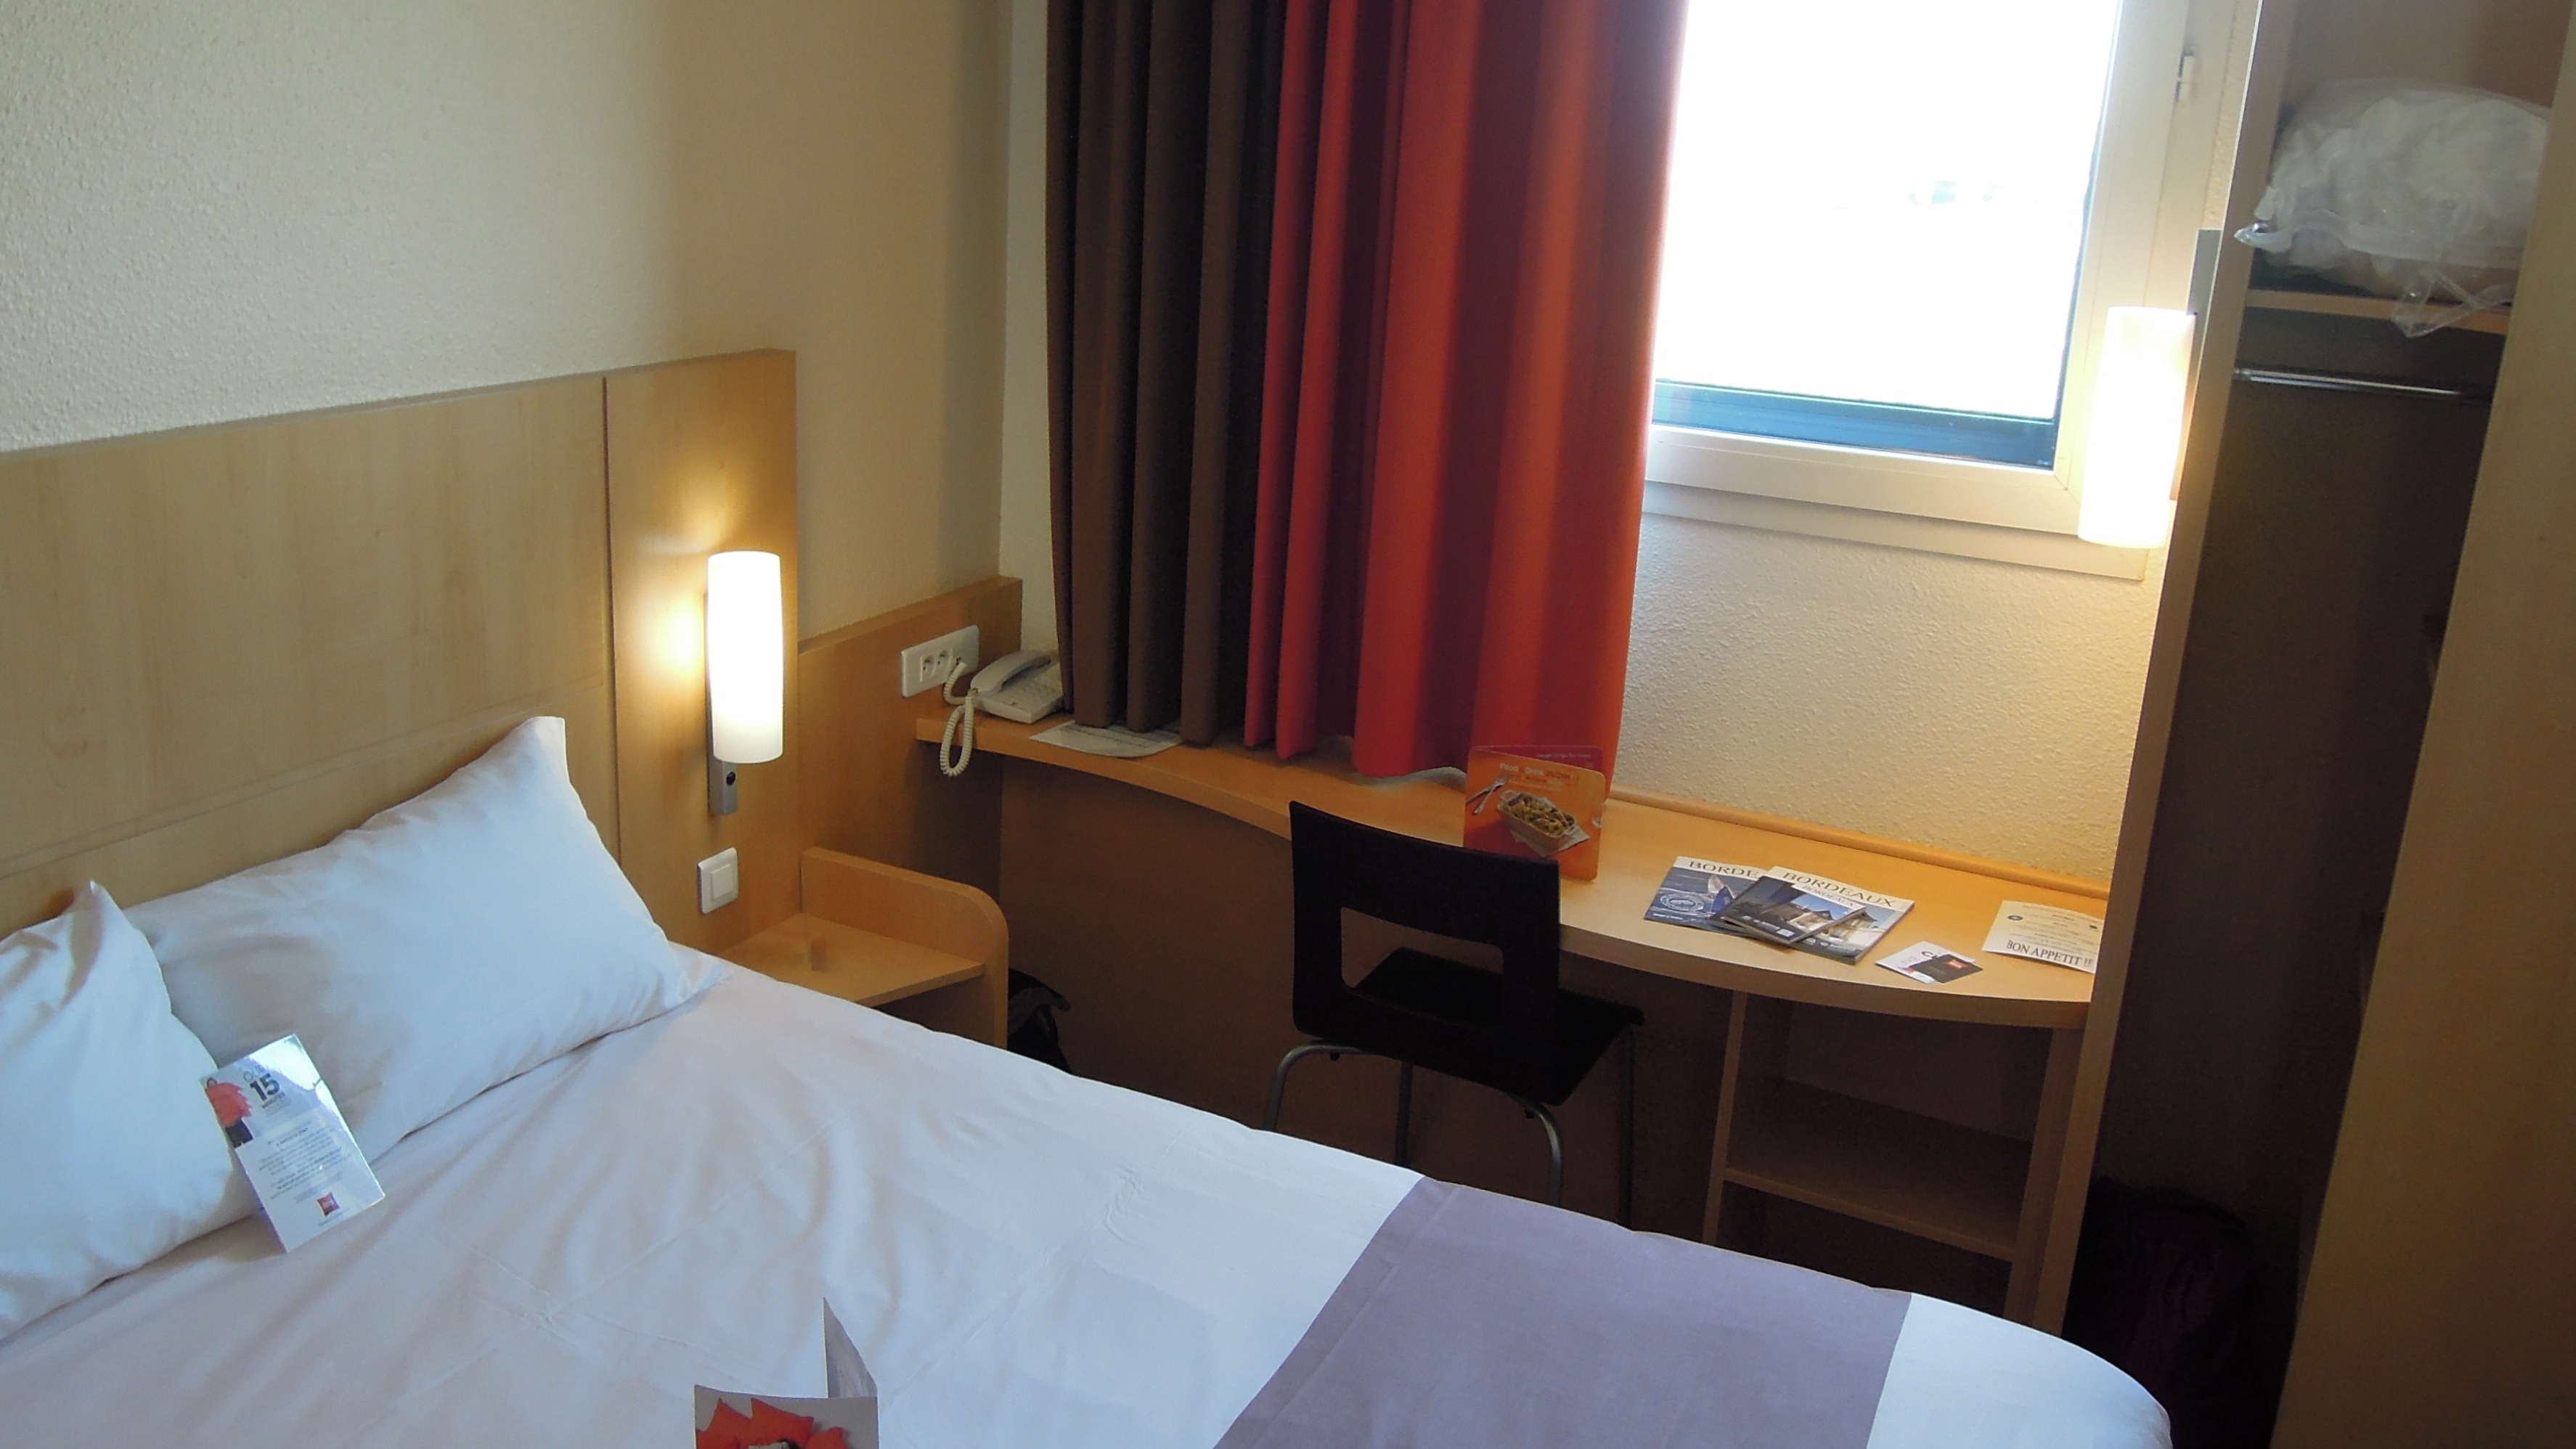 Hotel Ibis Saint Malo